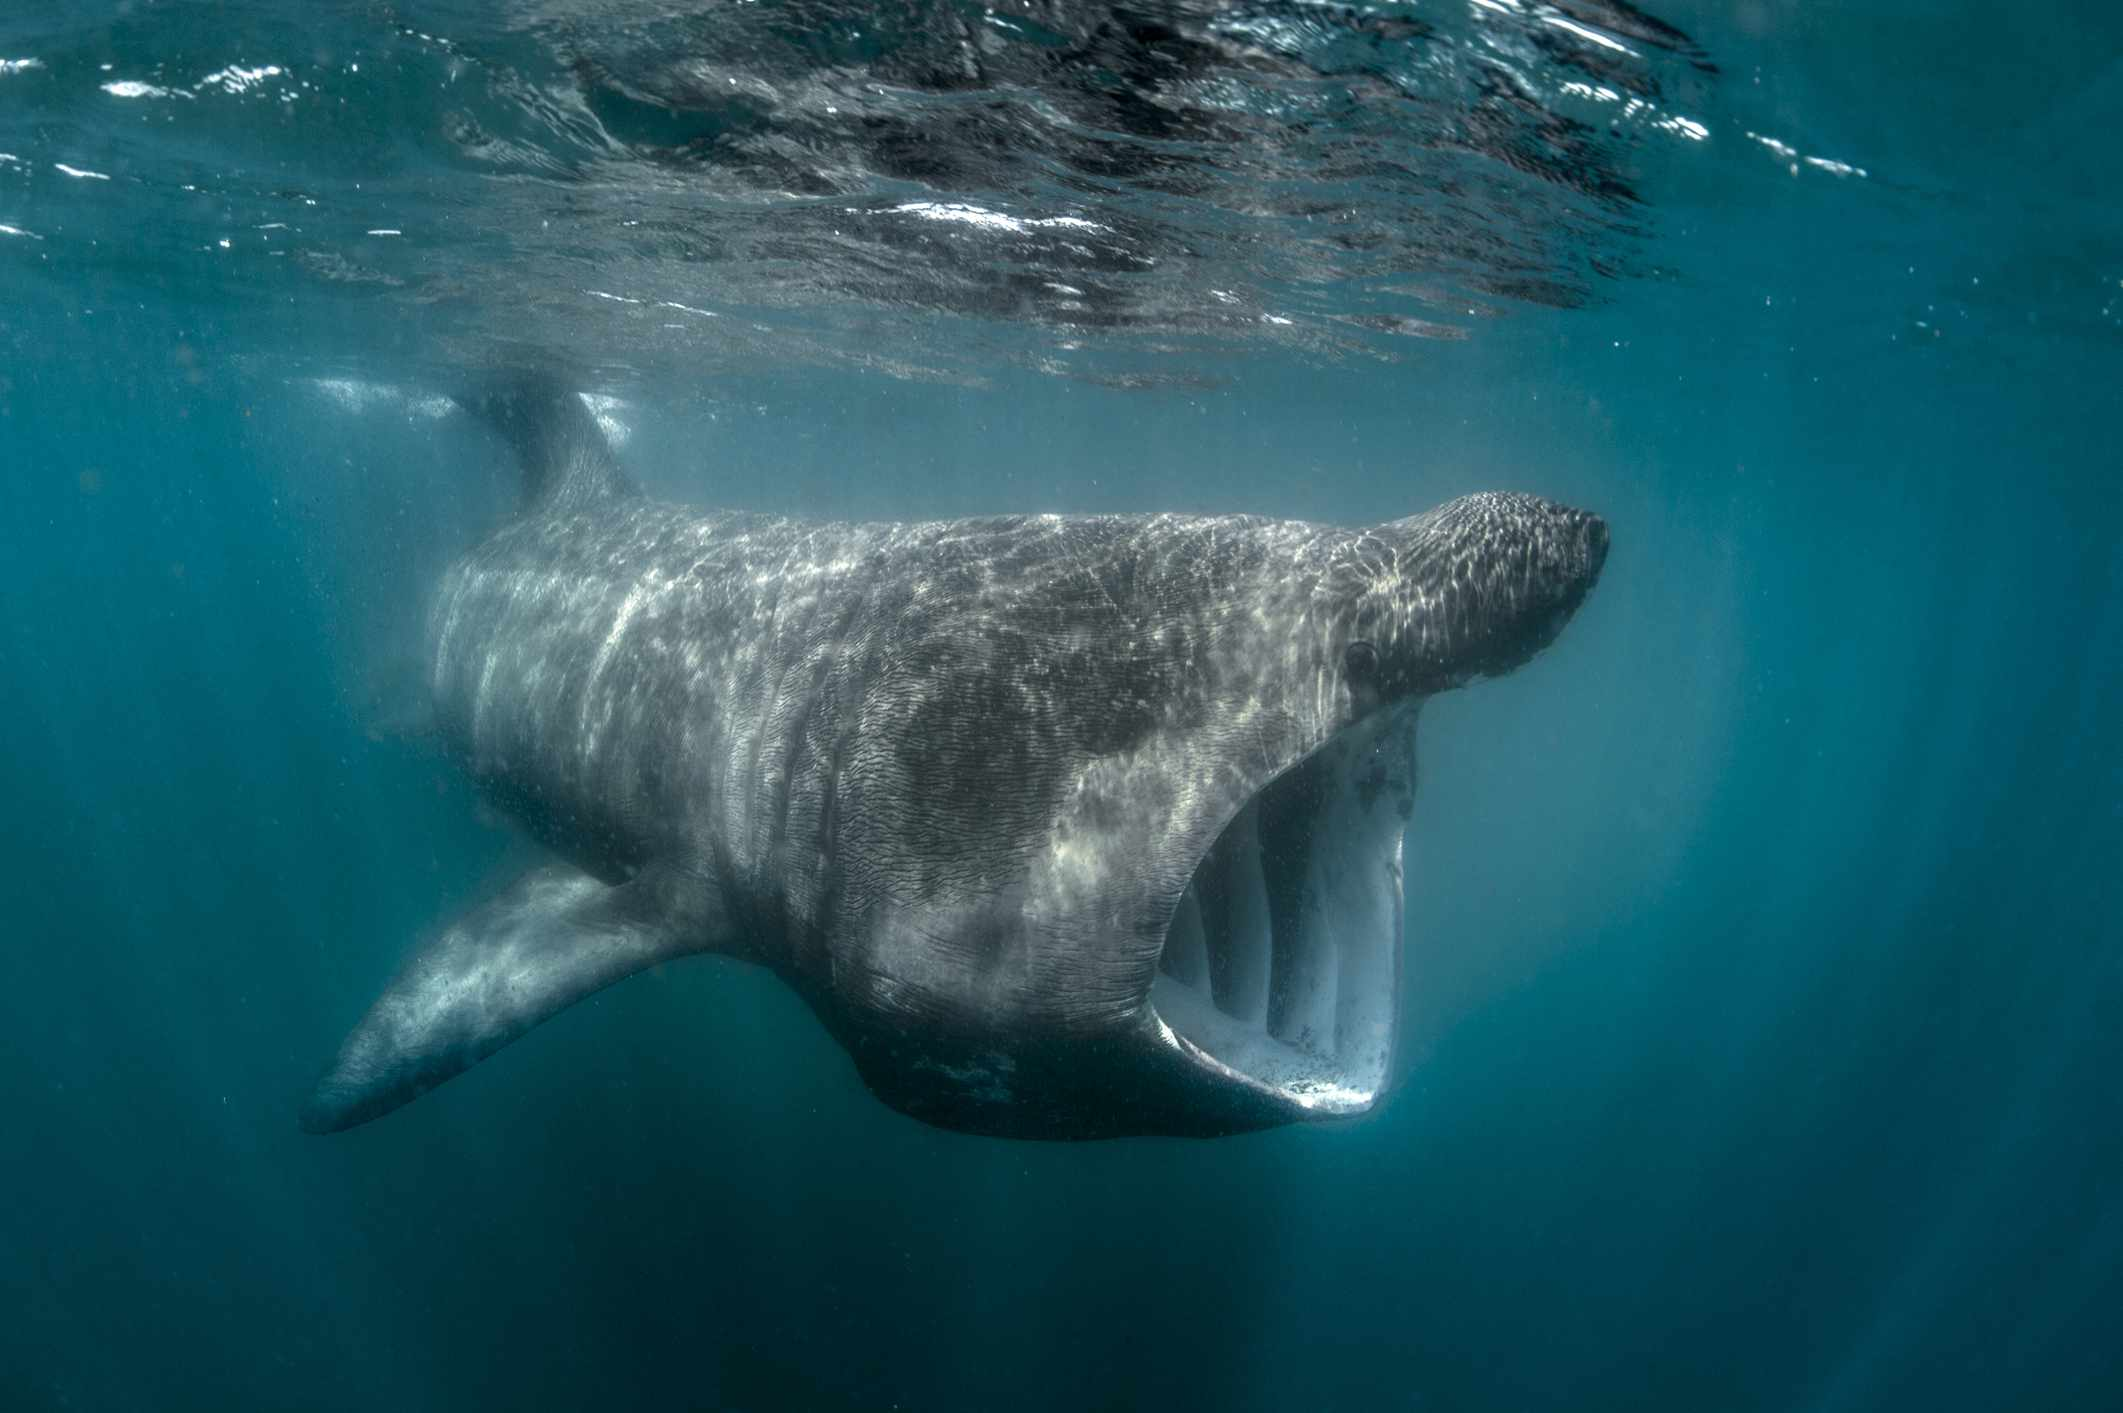 Underwater view of a basking shark, UK